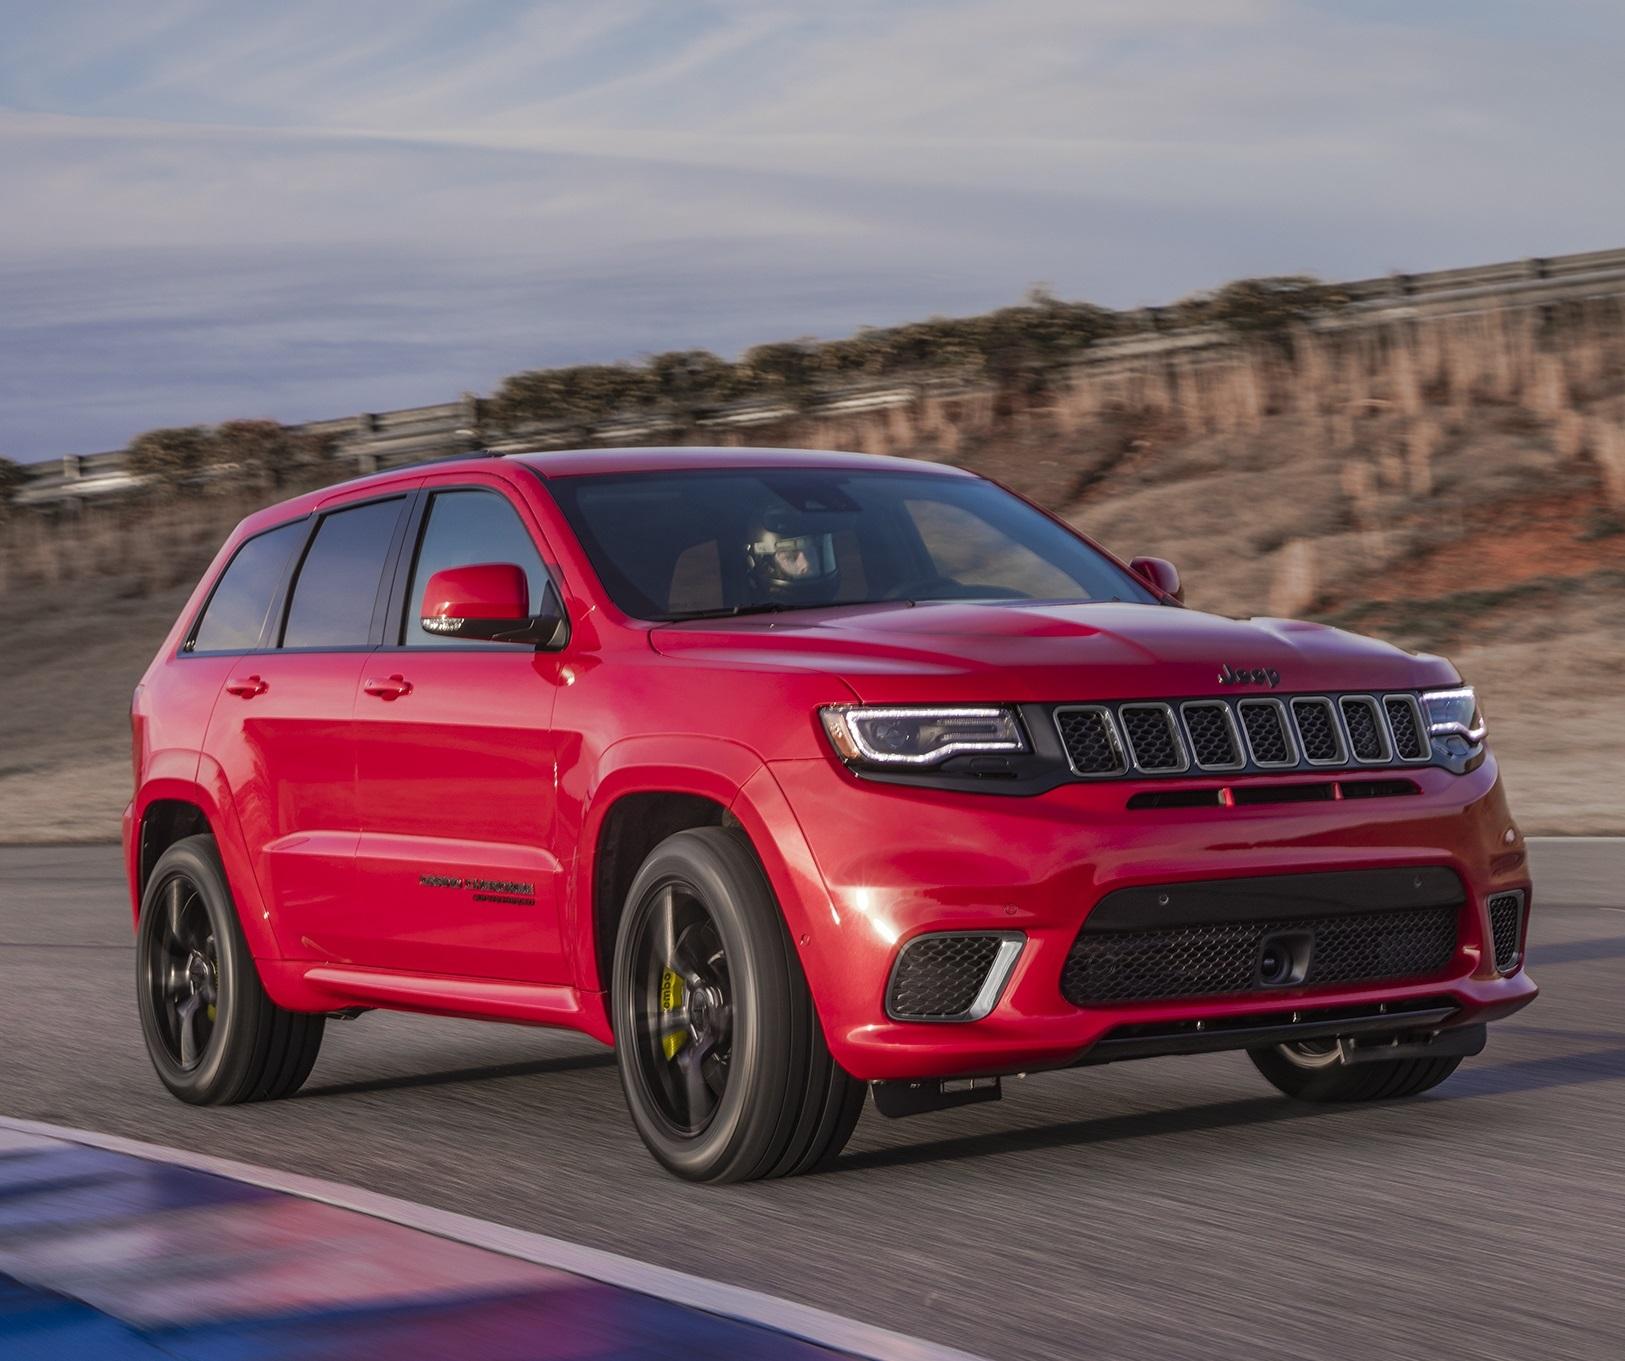 The 2018 Jeep Grand Cherokee Trackhawk  (FCA Photo)